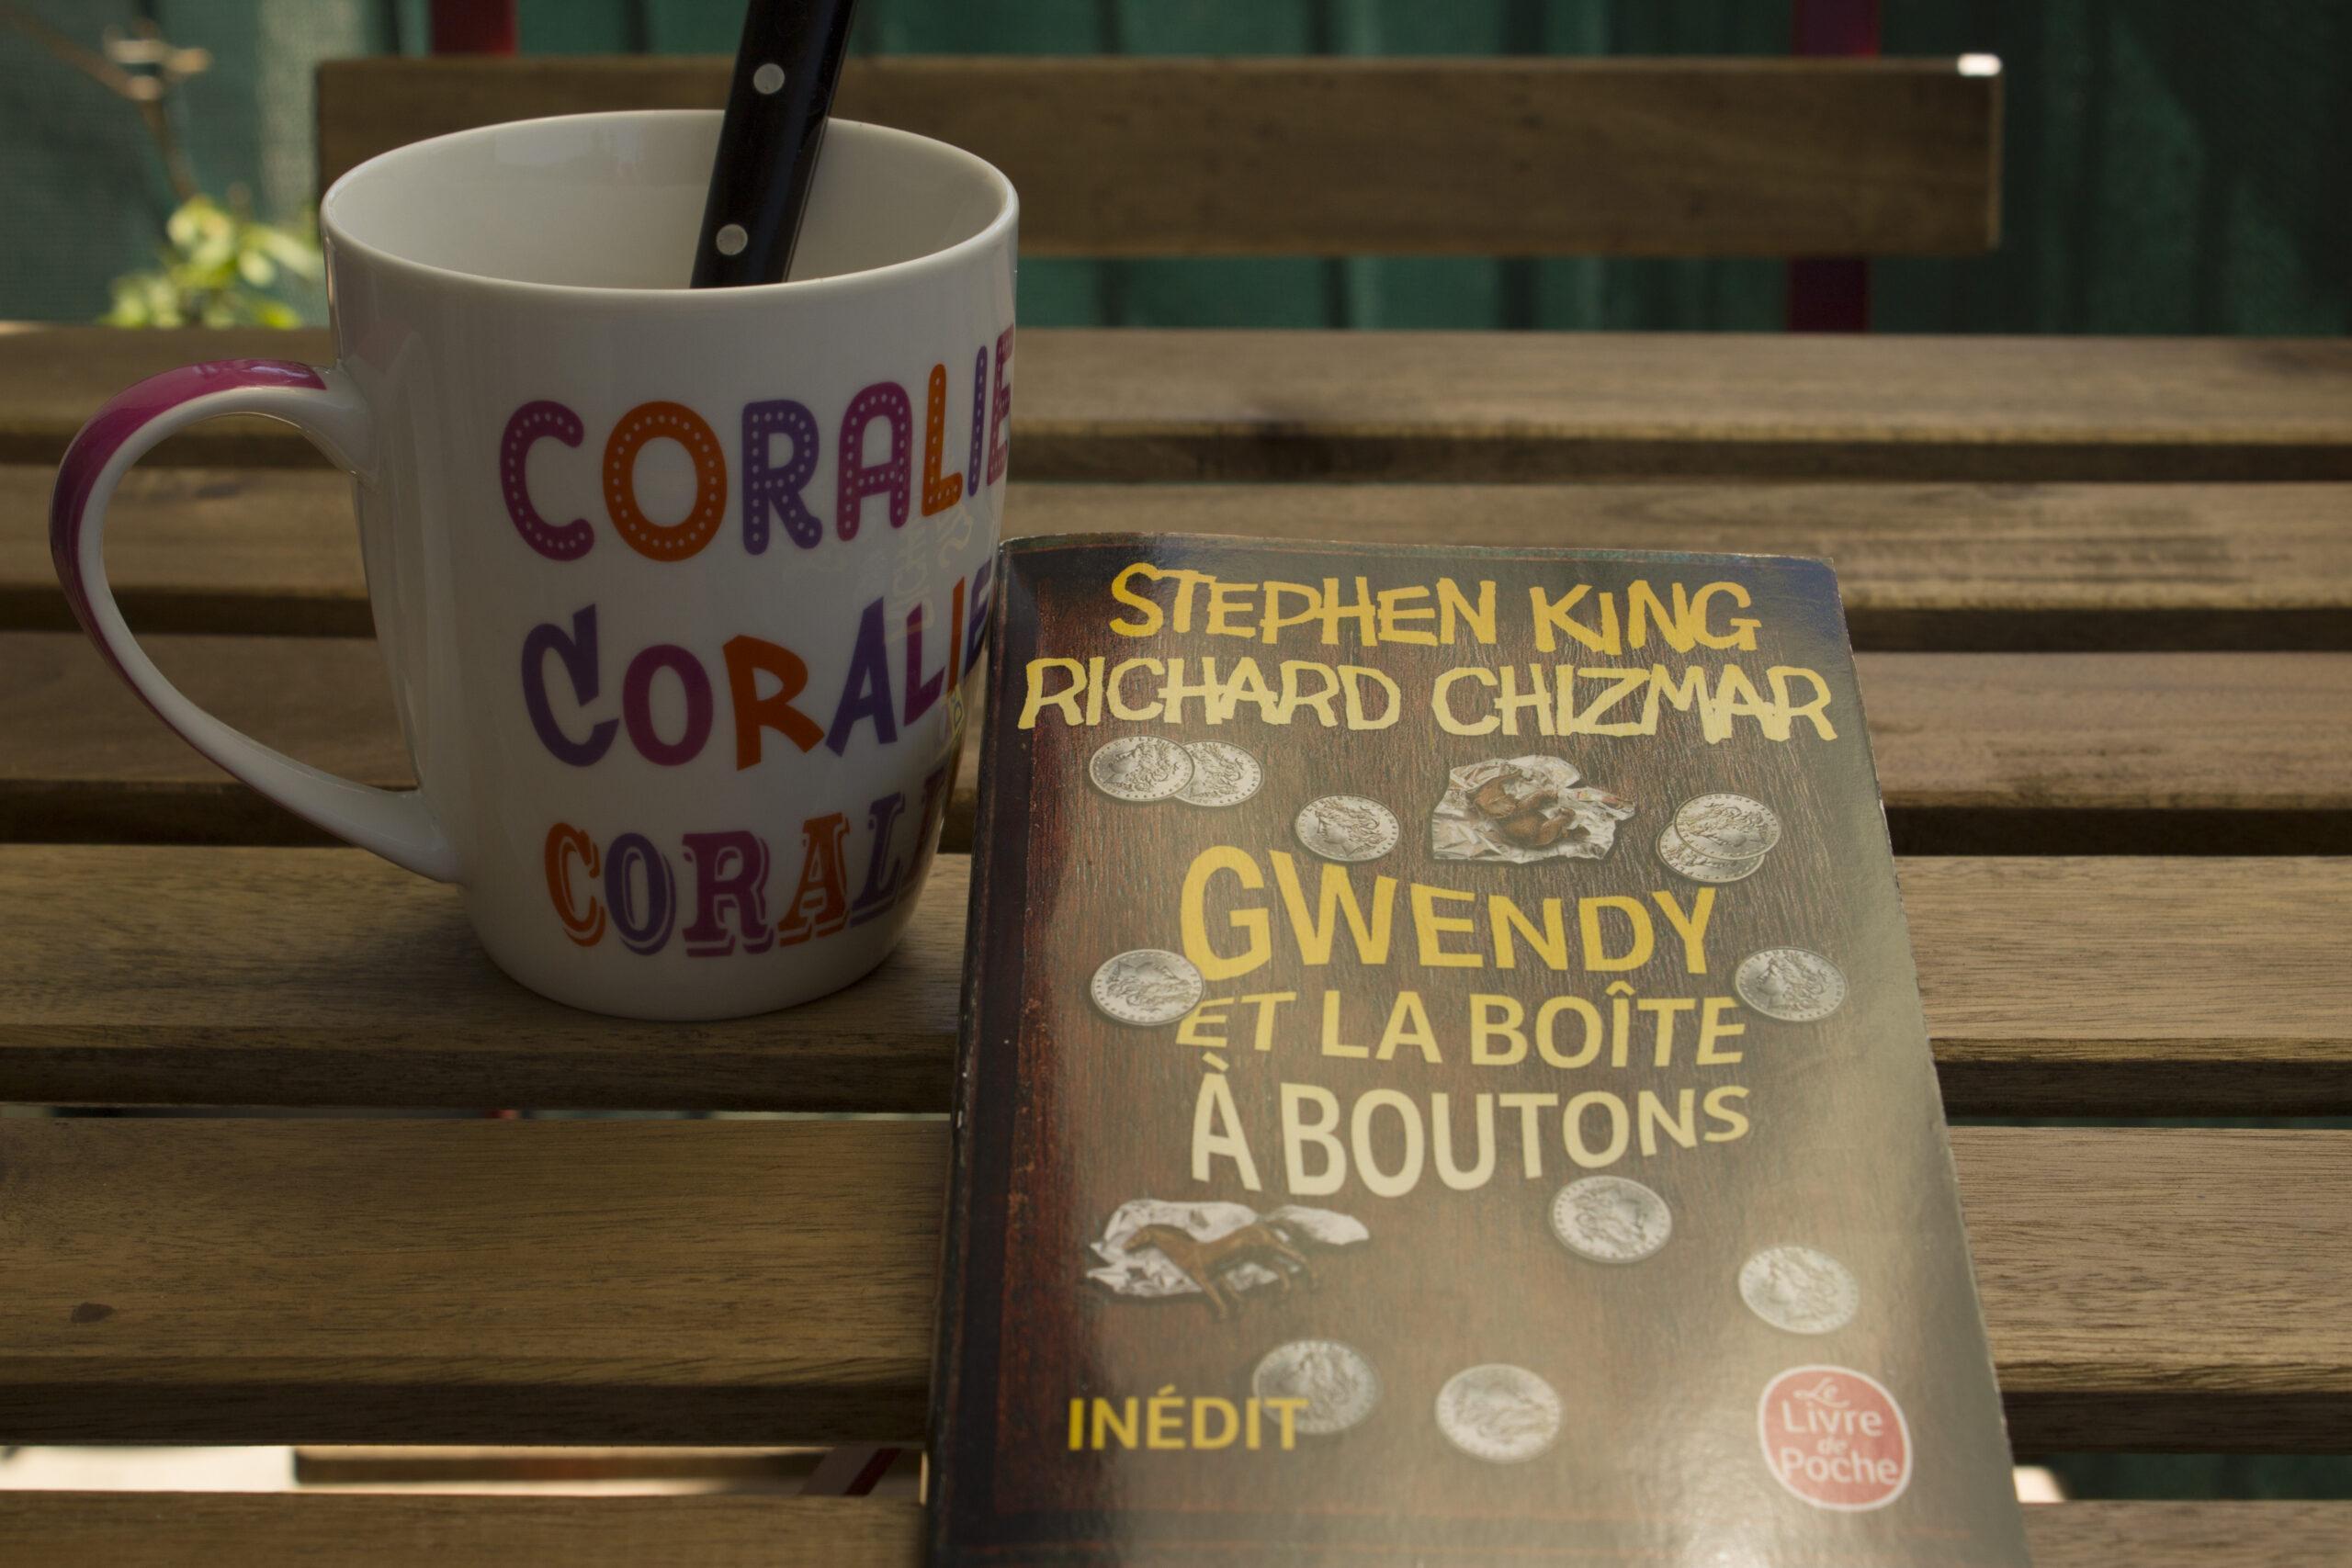 Gwendy et la boîte à bouton –  King & Chizmar